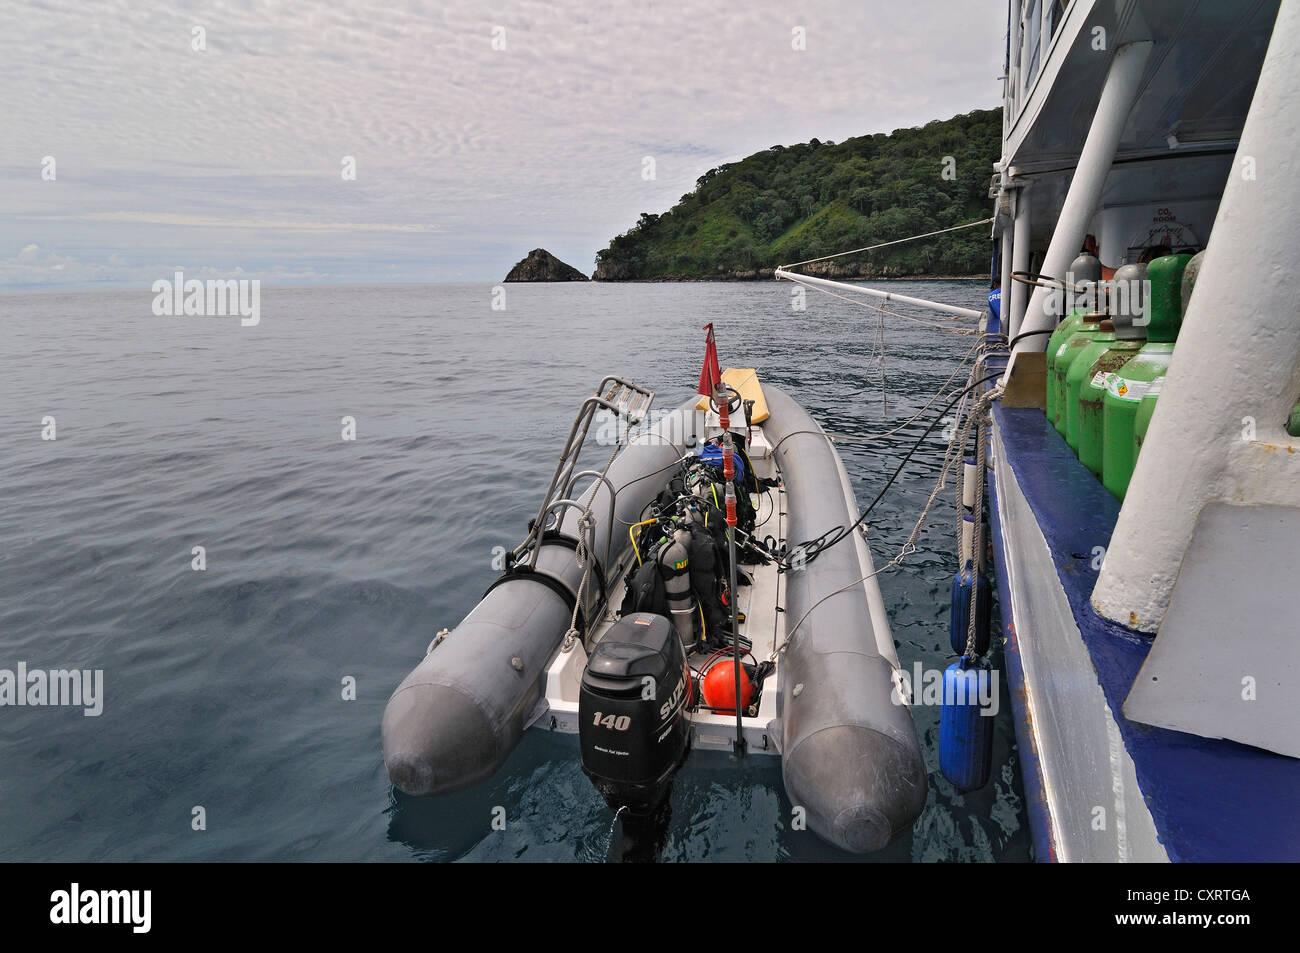 Rubber raft with compressed air tanks, Okeanoss Aggressor ship, Cocos Island, Costa Rica, Central America - Stock Image